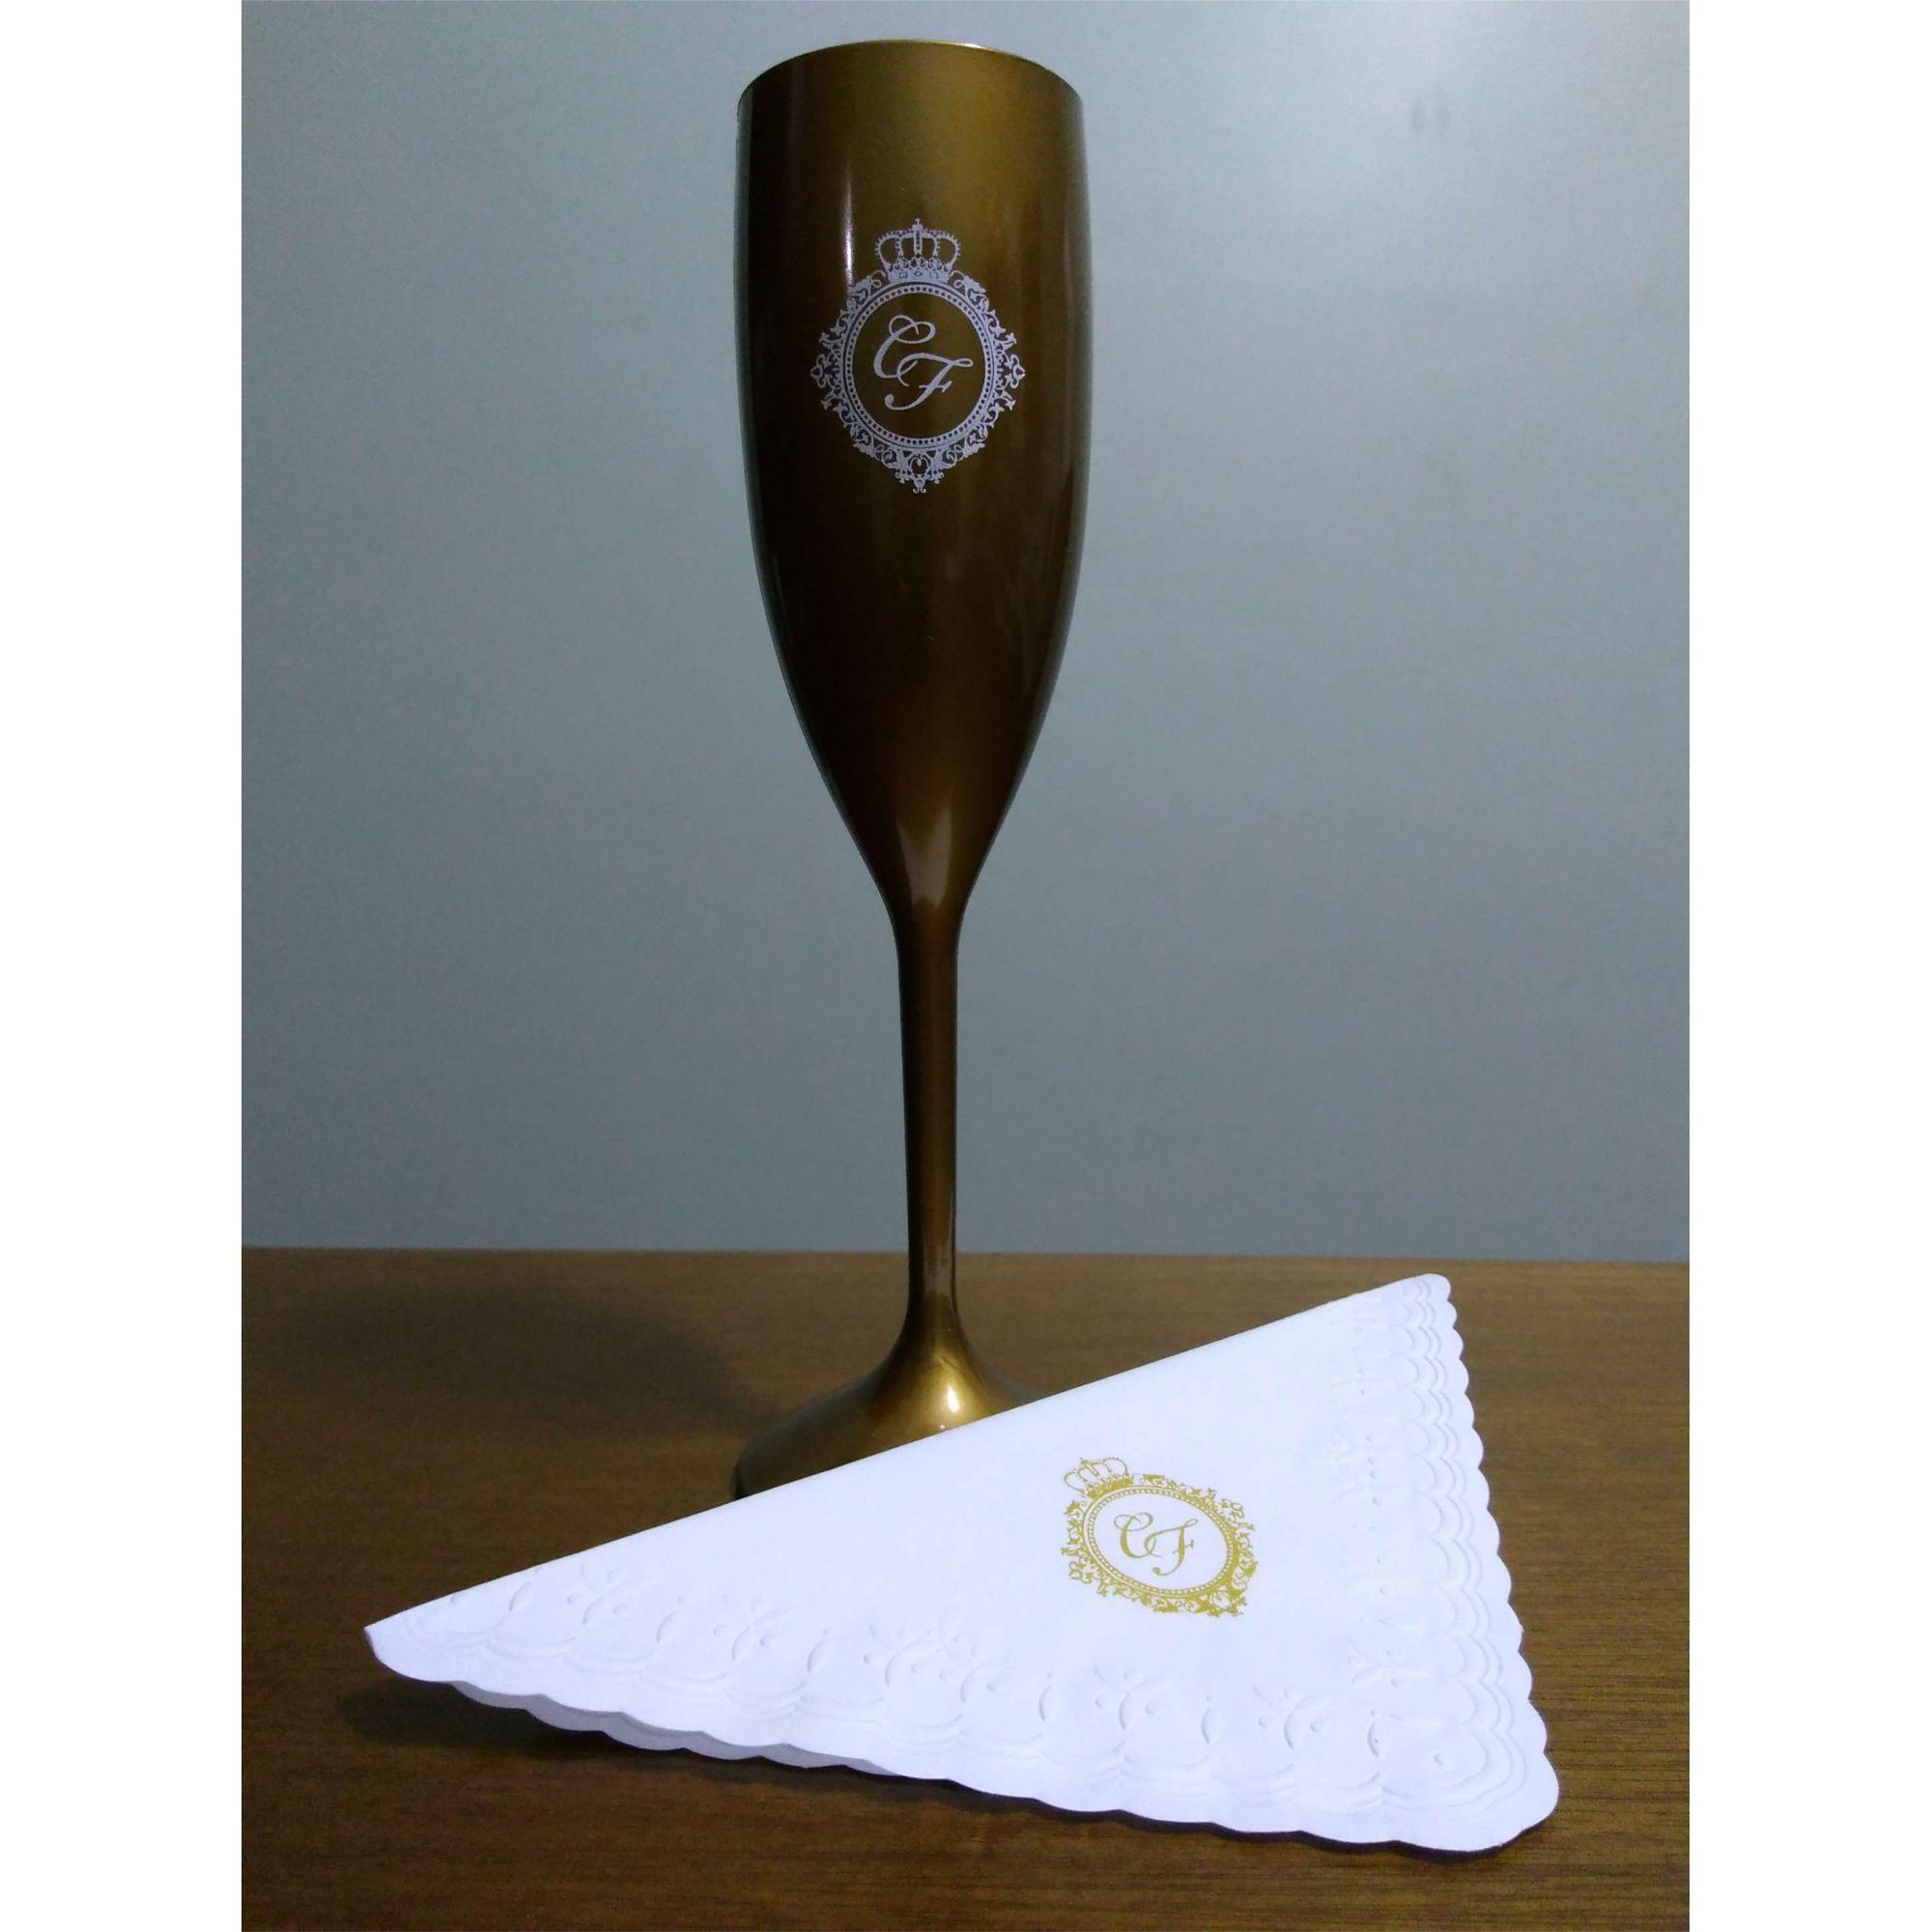 Kit taça  + guardanapo 15x15cm personalizados  - 50 unidades  - Persona Guardanapos & Cia